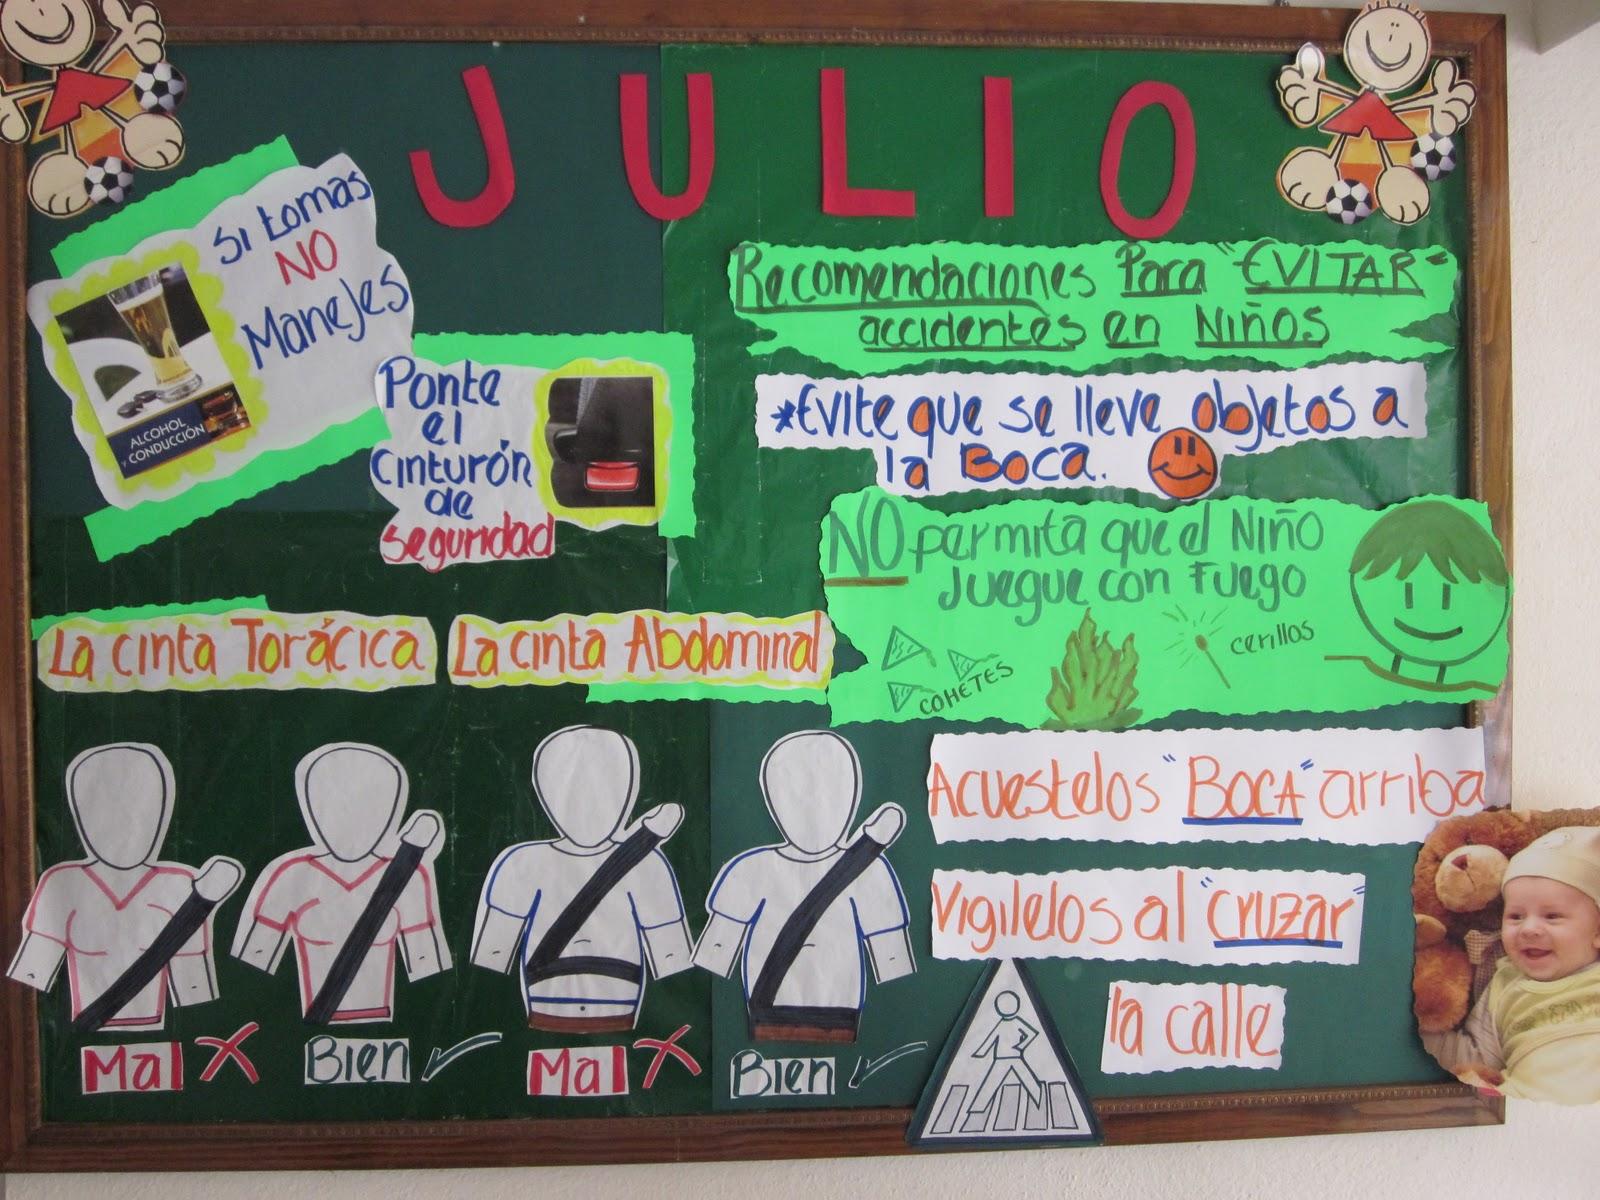 Periodico mural mes de julio 2012 17 best images about for Diario el mural de jalisco